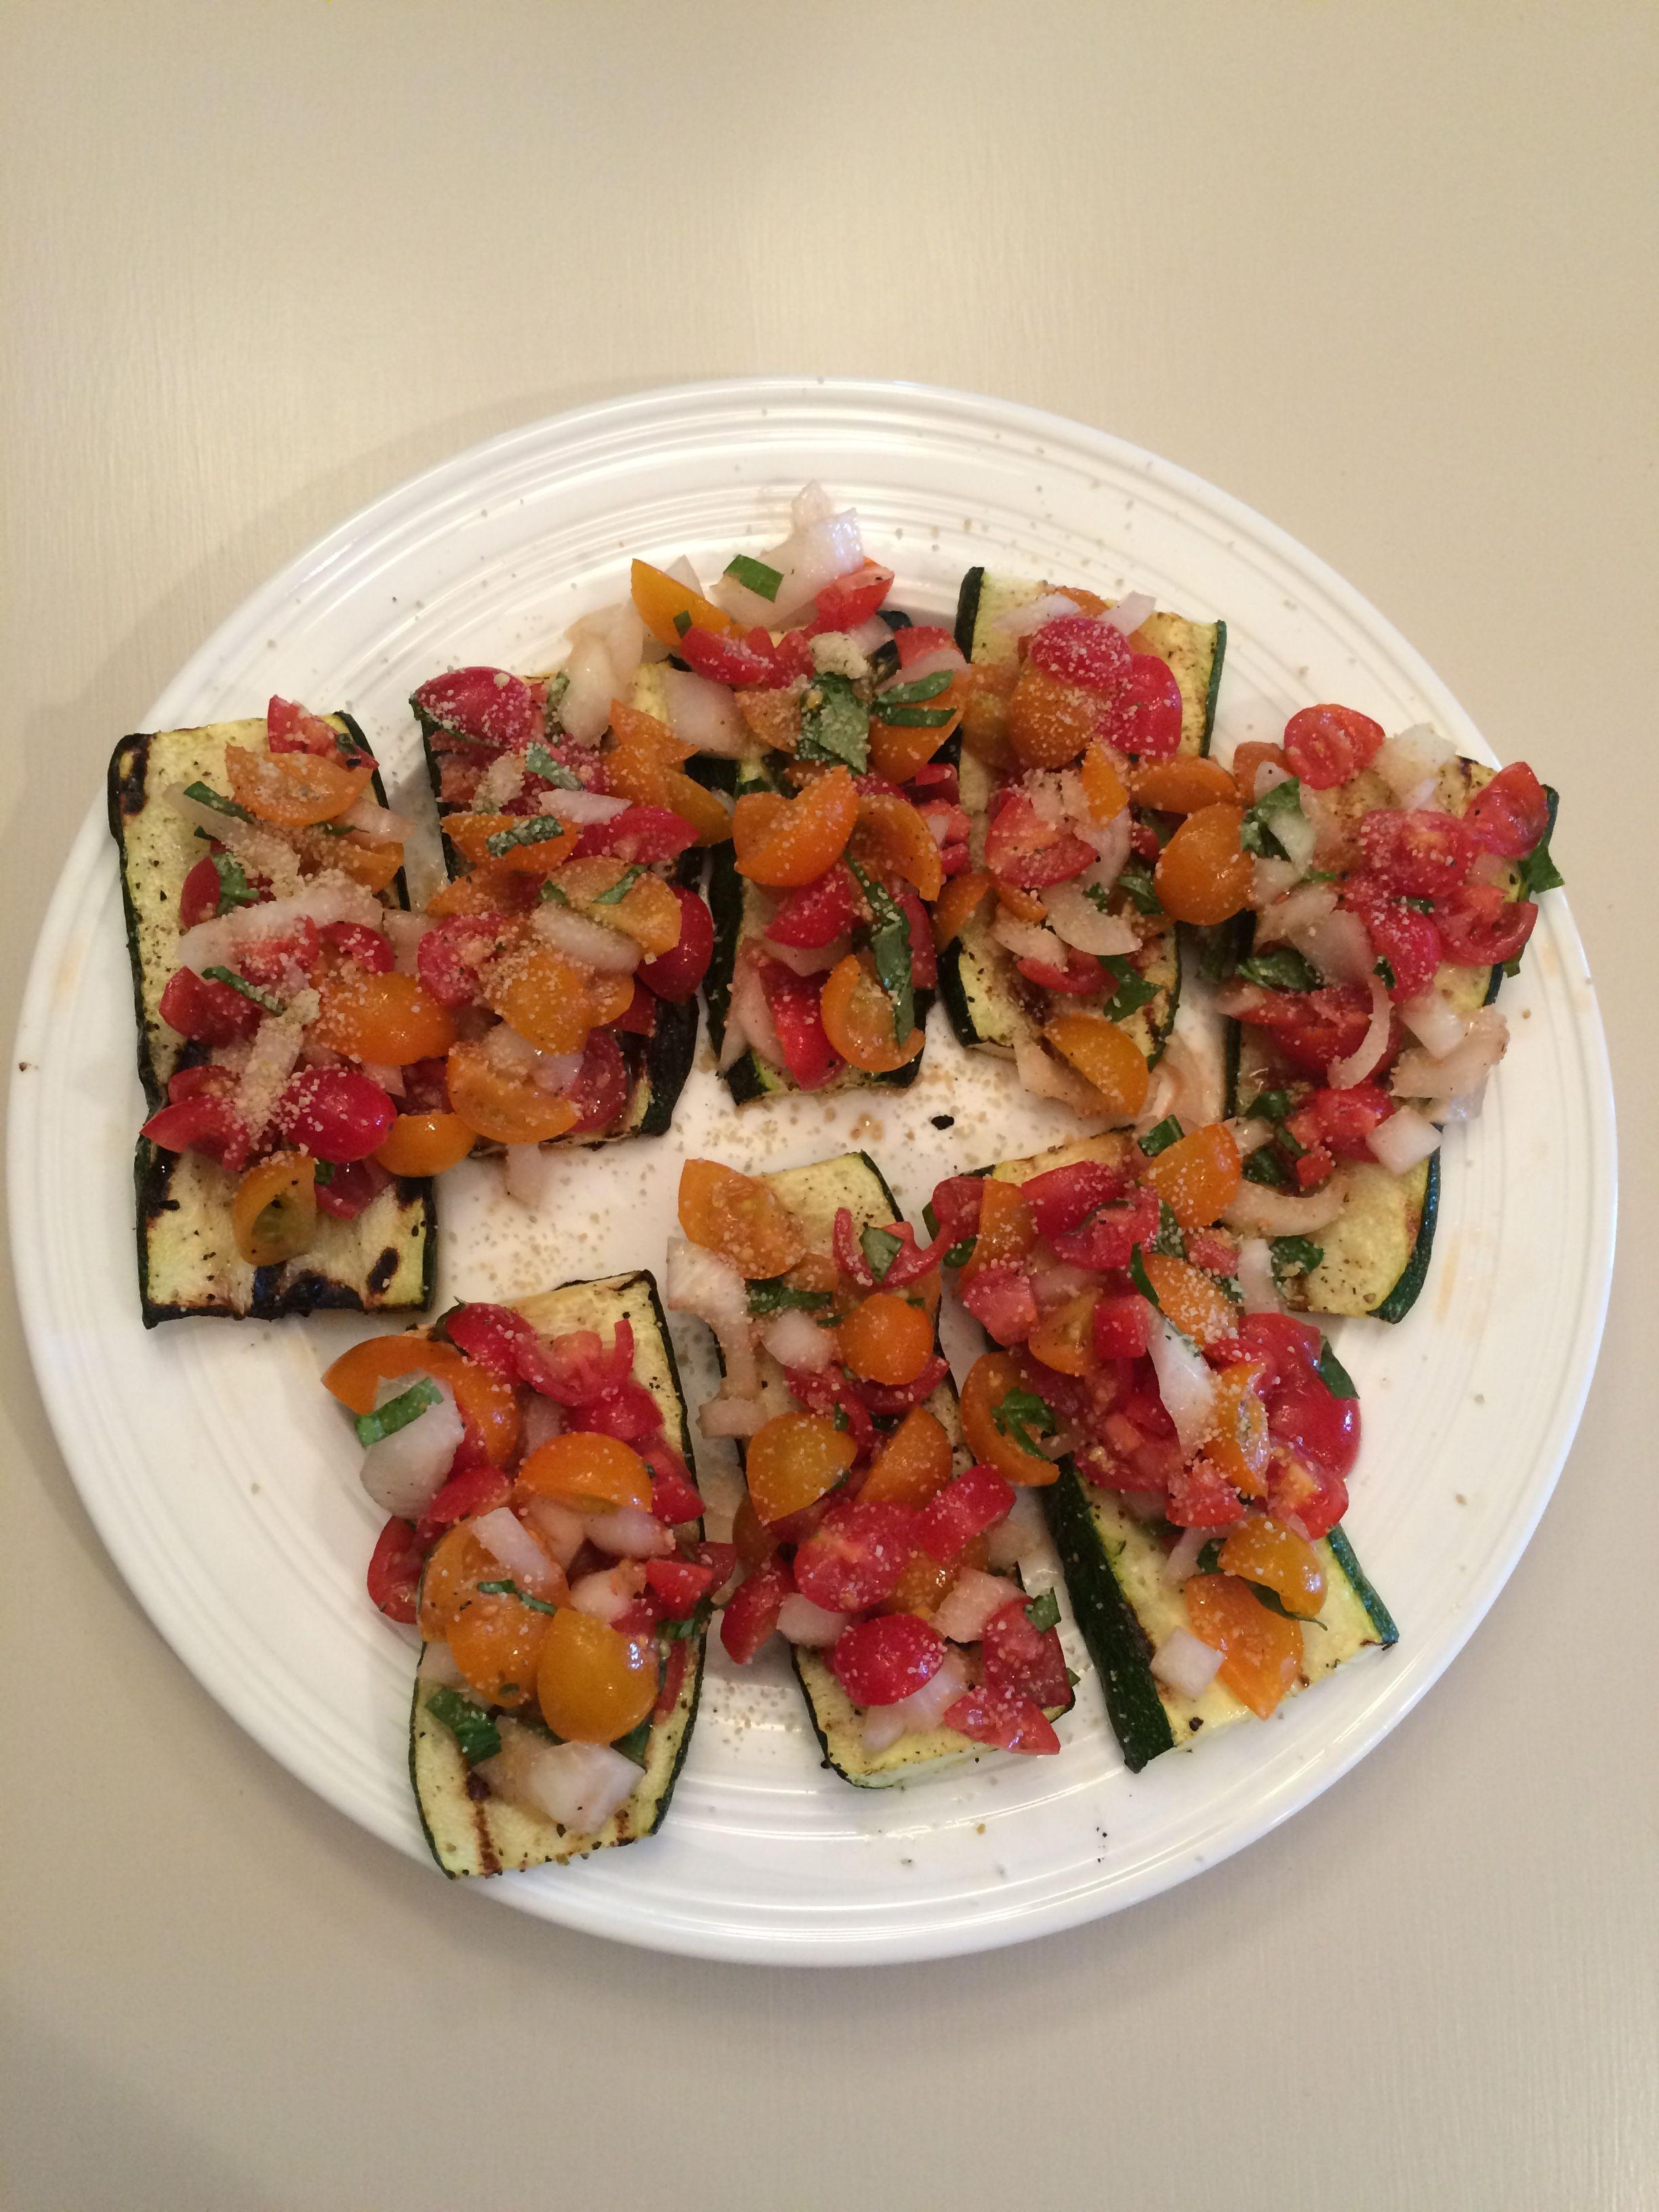 Vegan Zucchini bruschetta  Grill zucchini, top with chopped cherry tomatoes,onion, garlic,1tspn EVO, lemon pepper, fresh basil